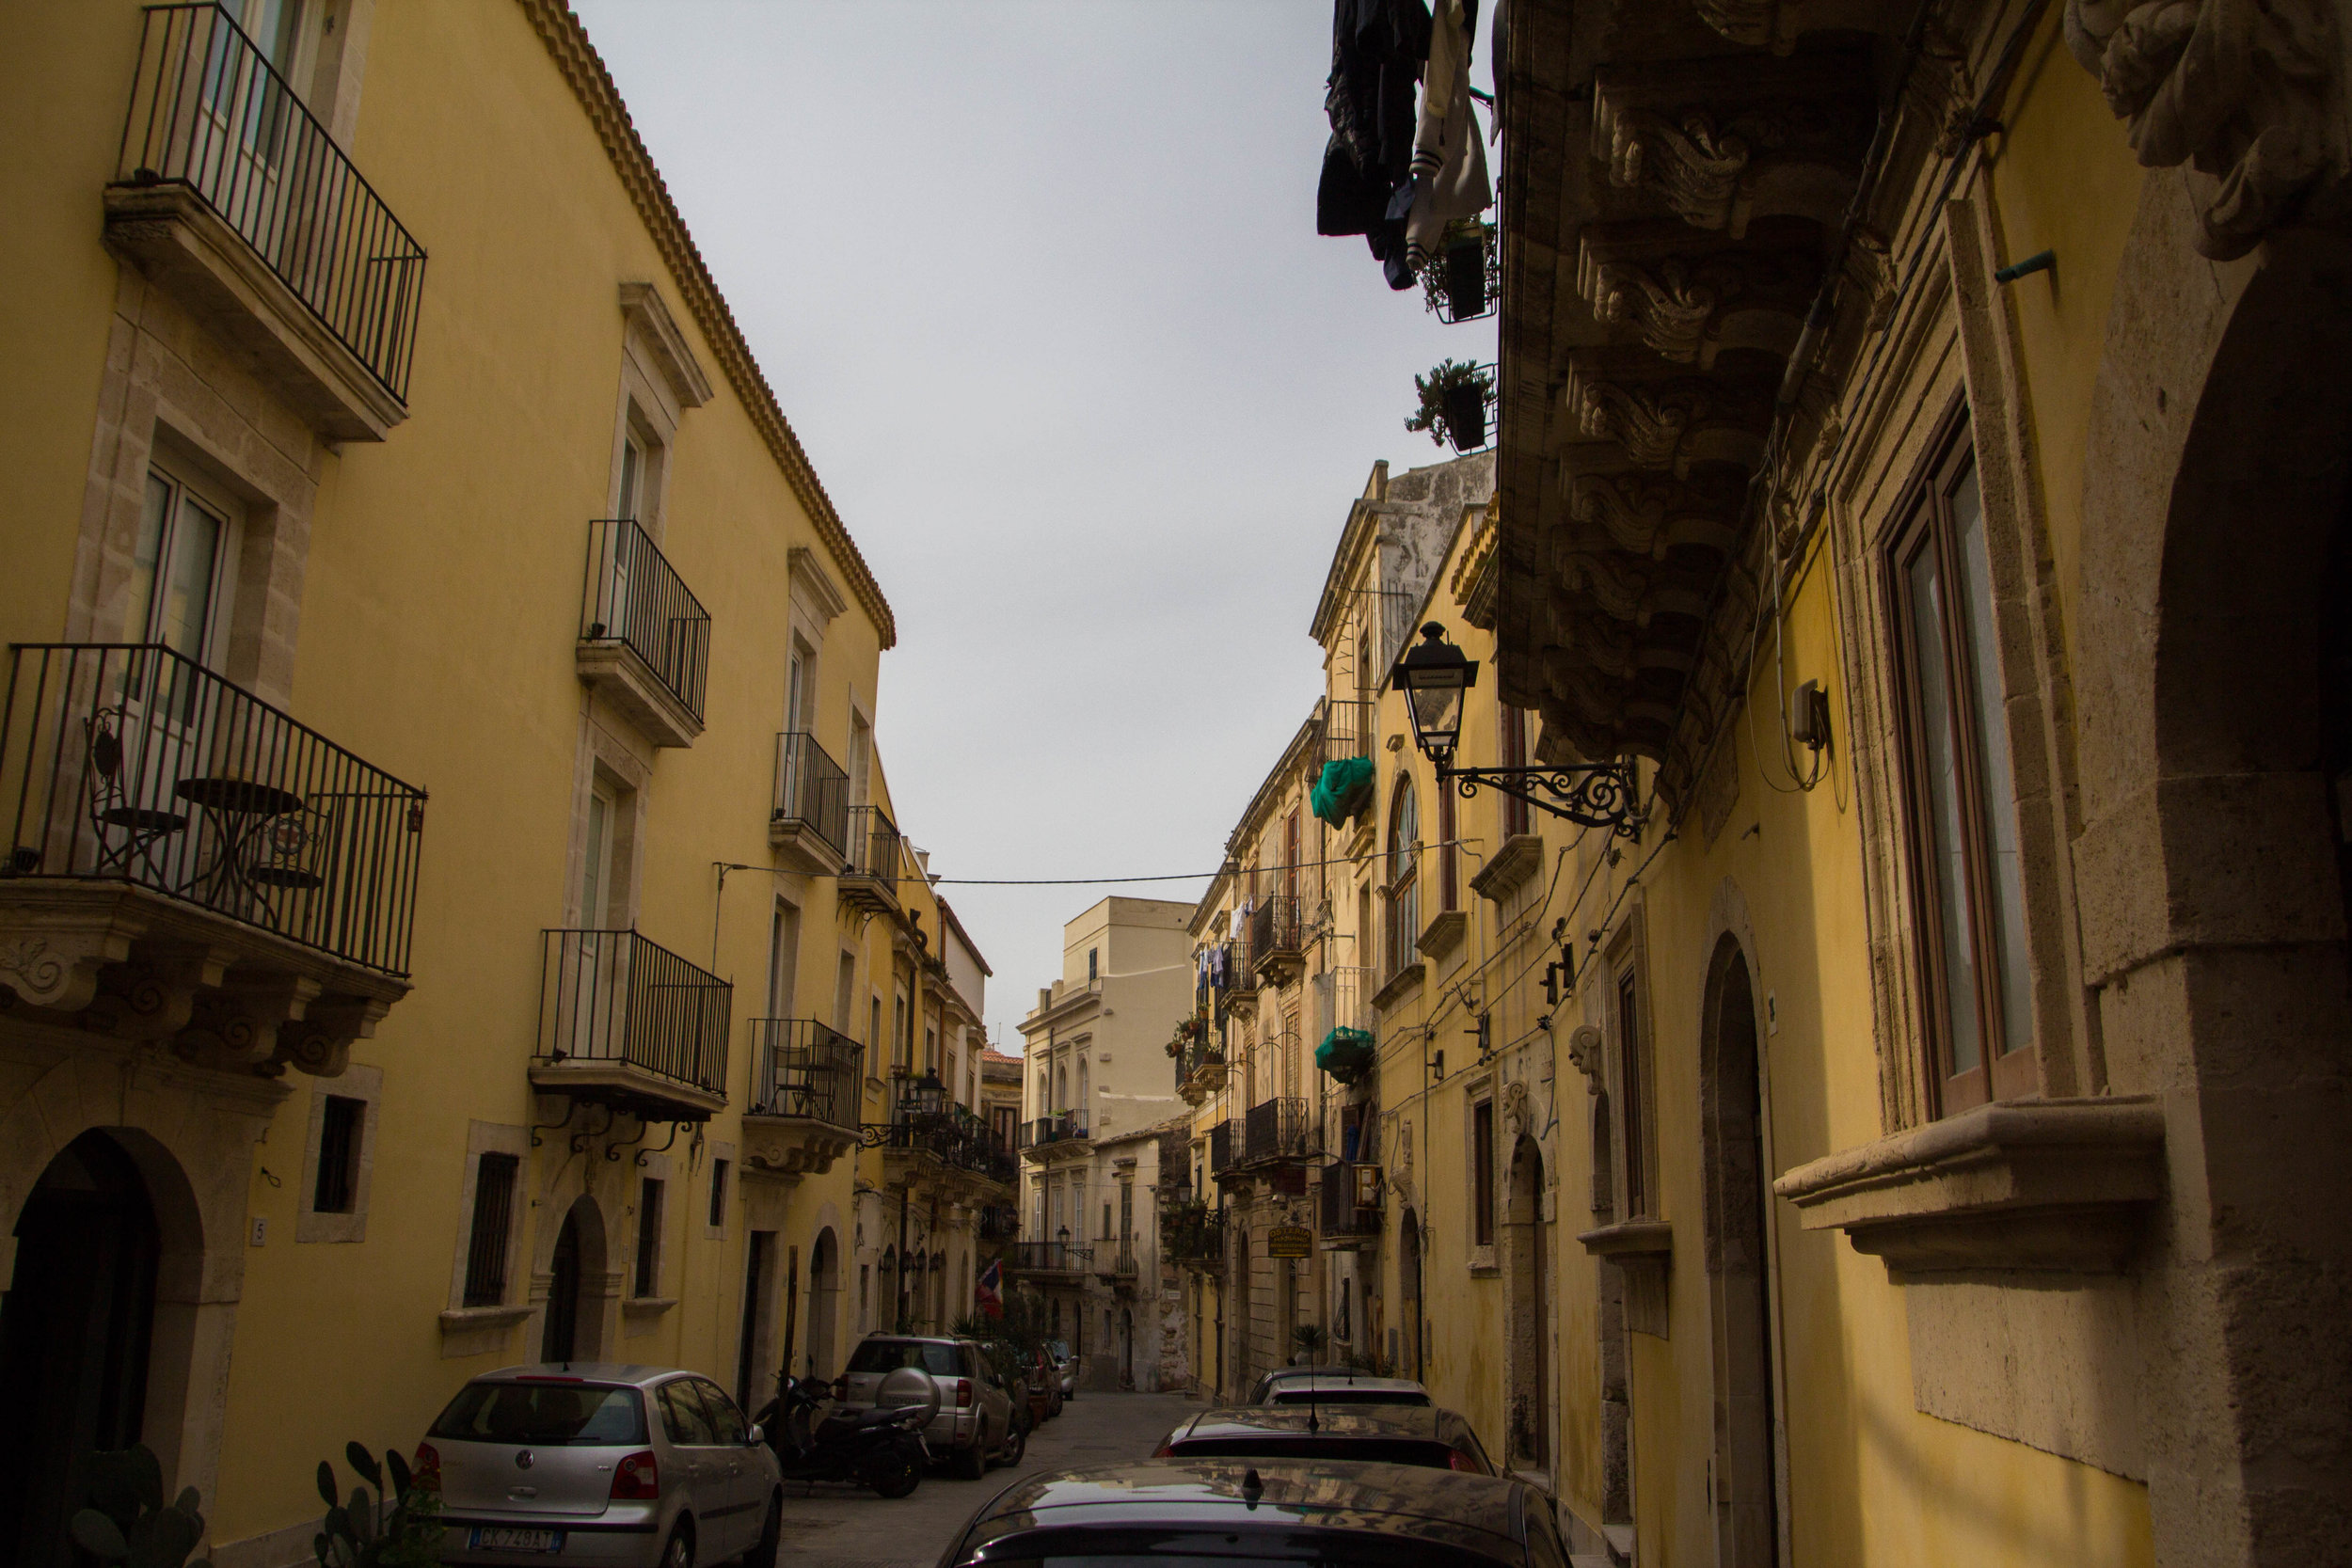 streets-ortygia-syracuse-sicily-20.jpg